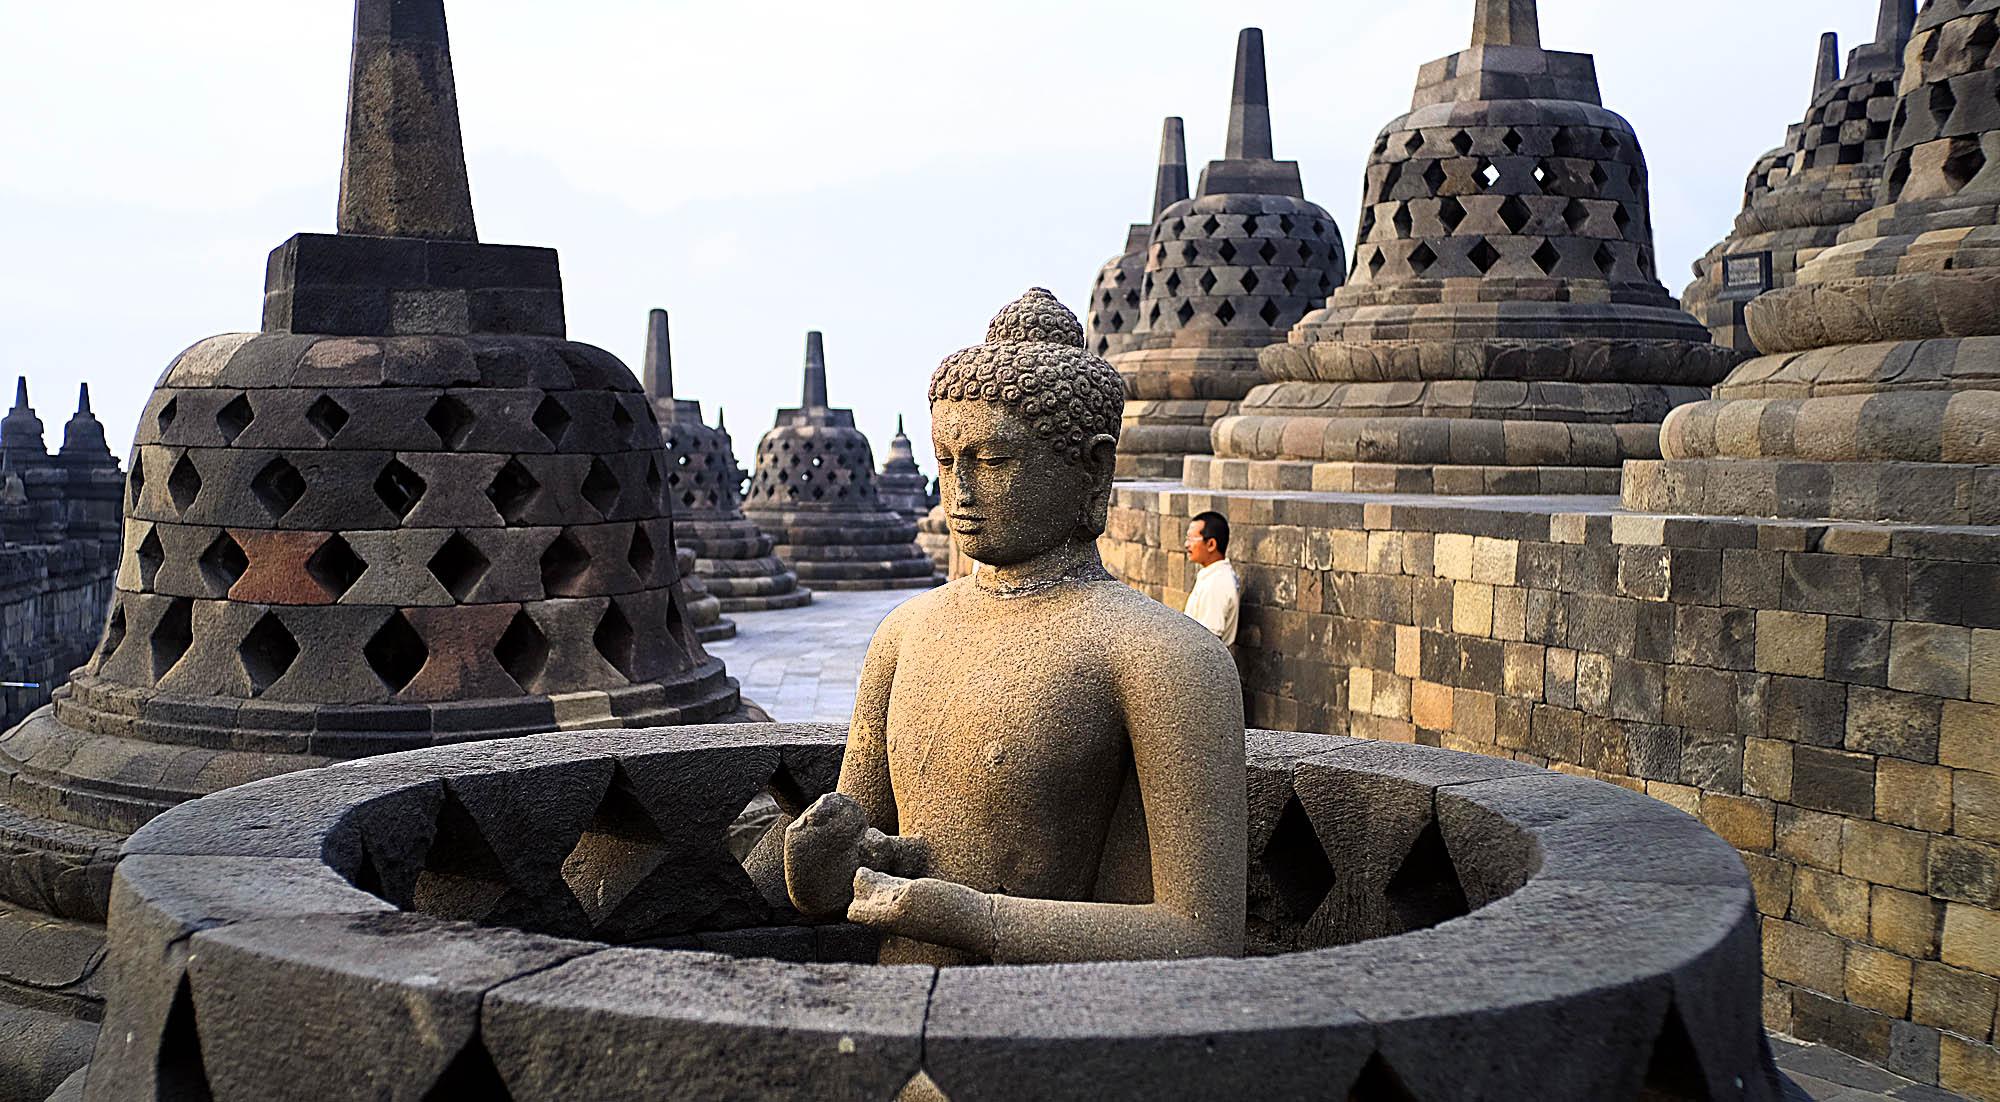 reise-ansichten Borobudur Buddha